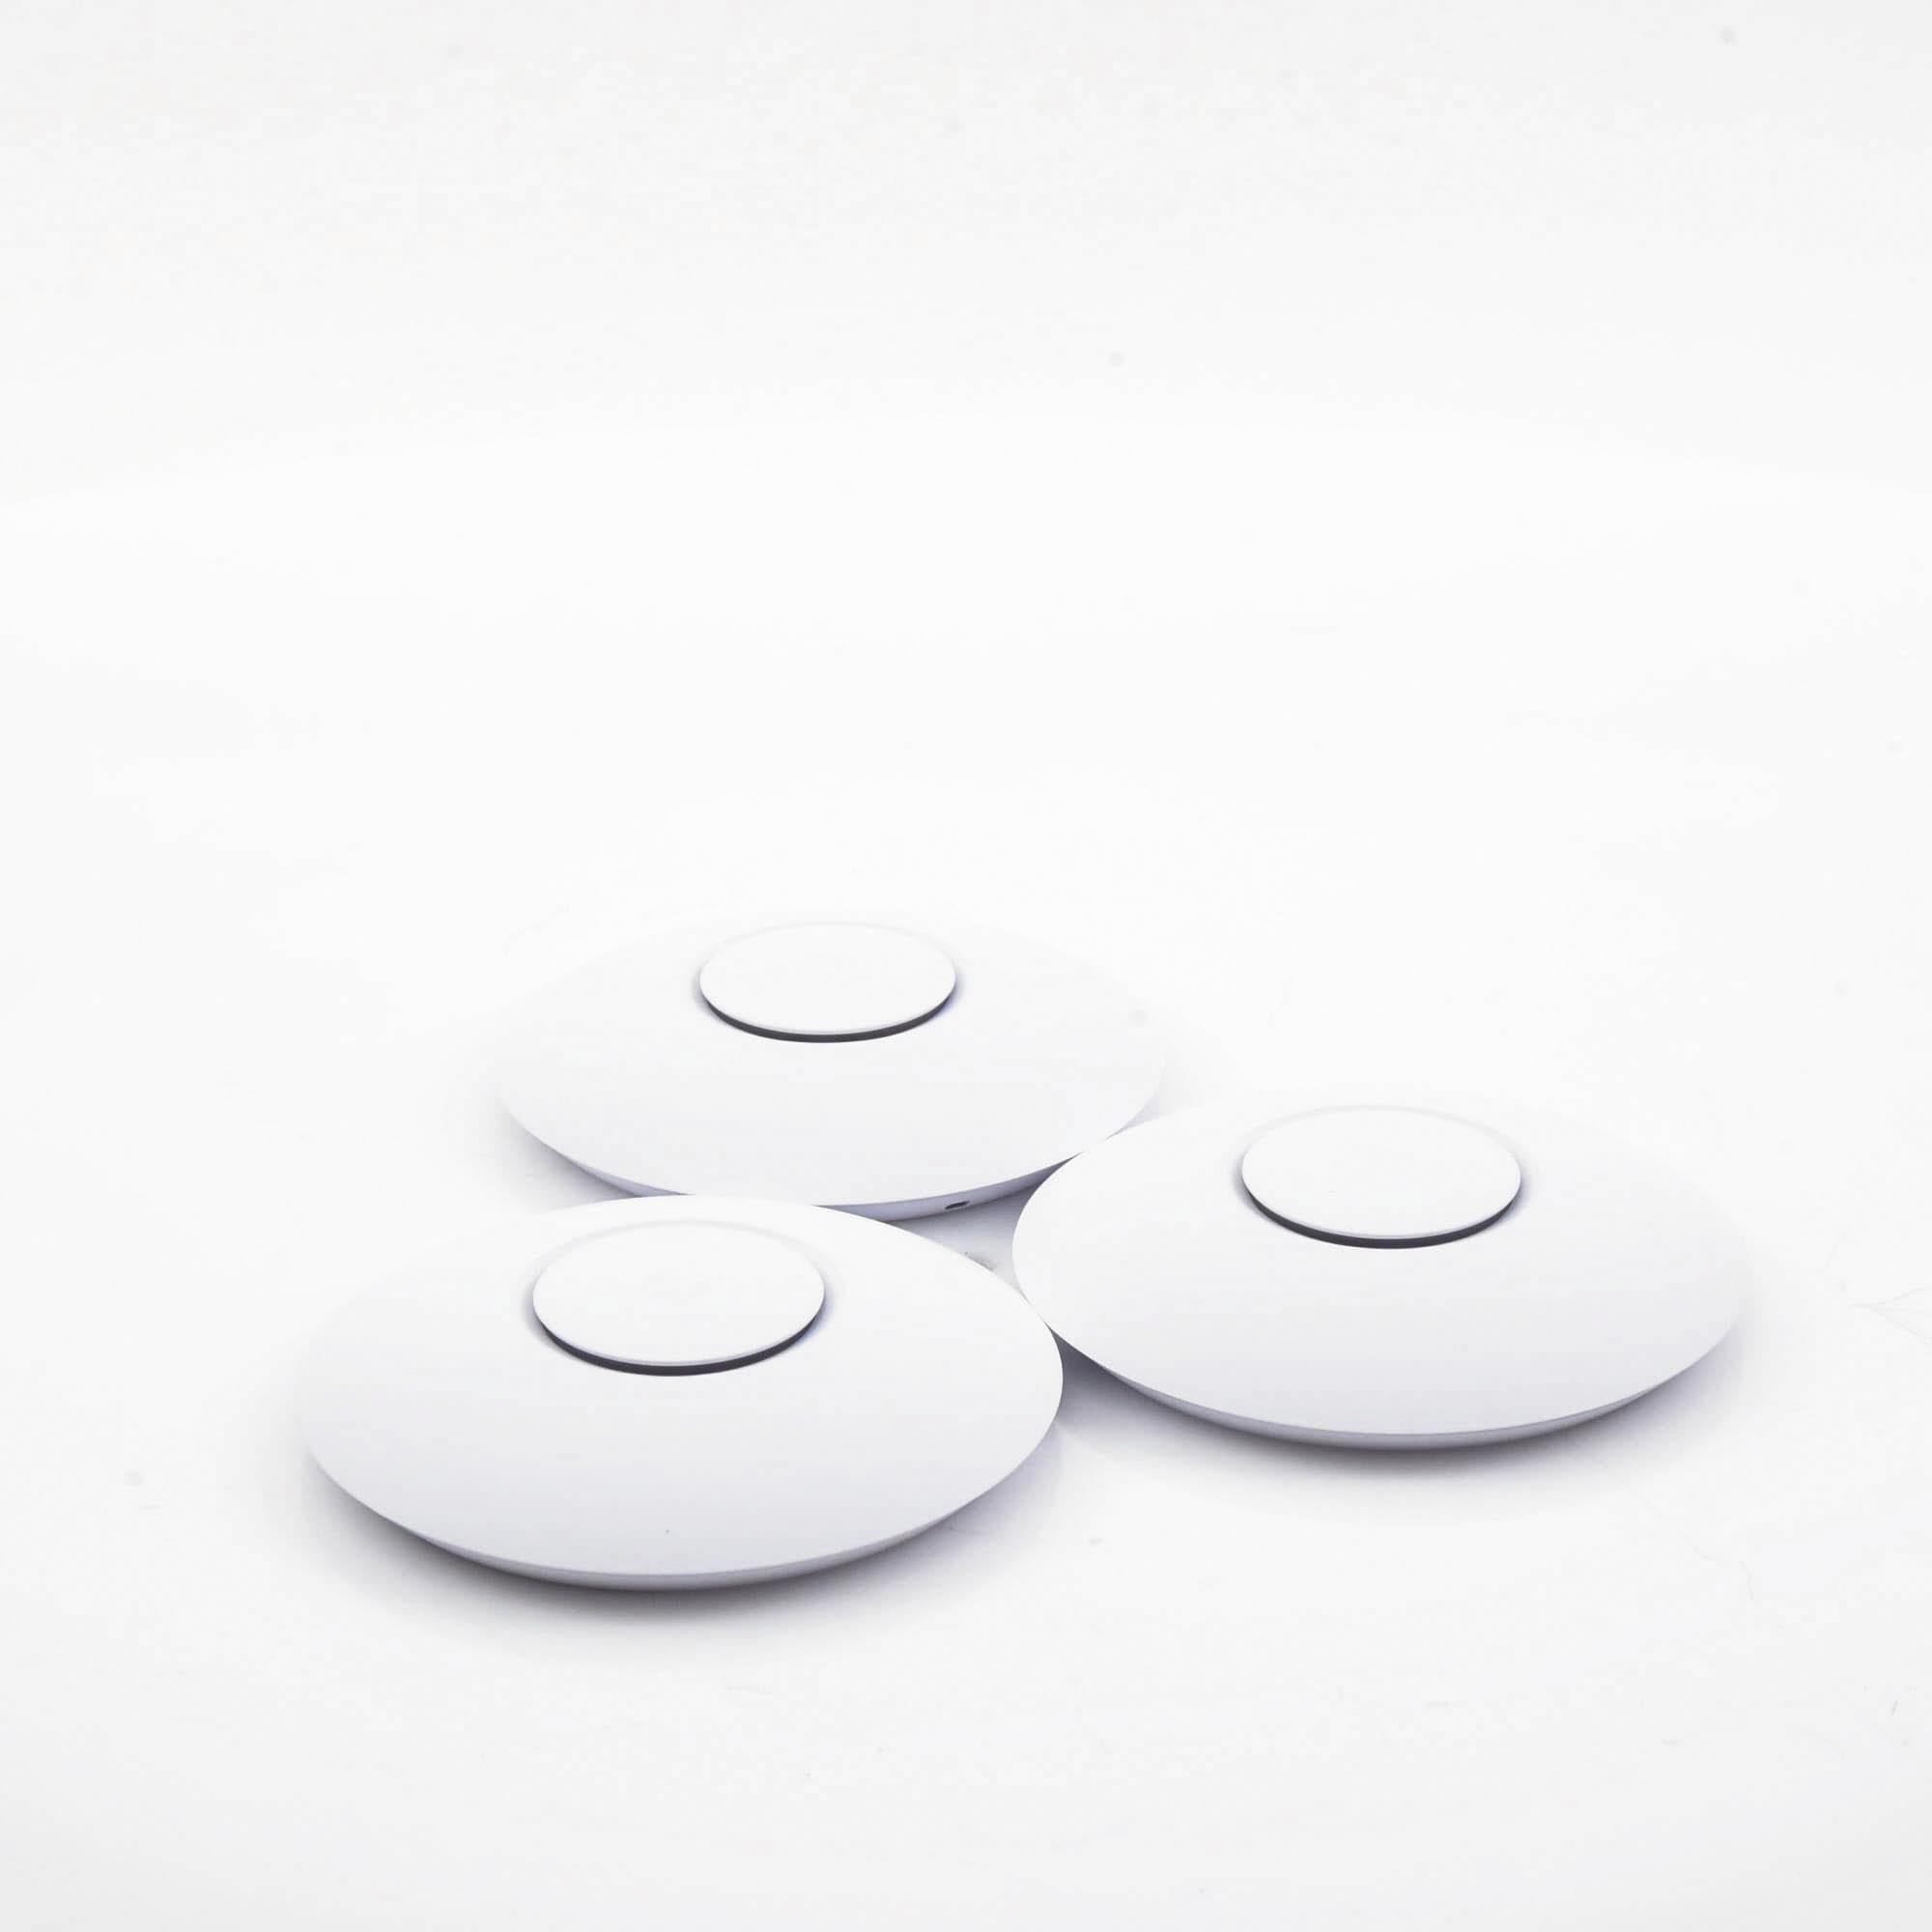 Paquete de 3 Access Point UniFi 802.11ac Wave 2, MU-MIMO4X4 con antena Beamforming, hasta 1.7 Gbps, para interior PoE 802.3af, soporta 200 clientes, No incluyen PoE?s